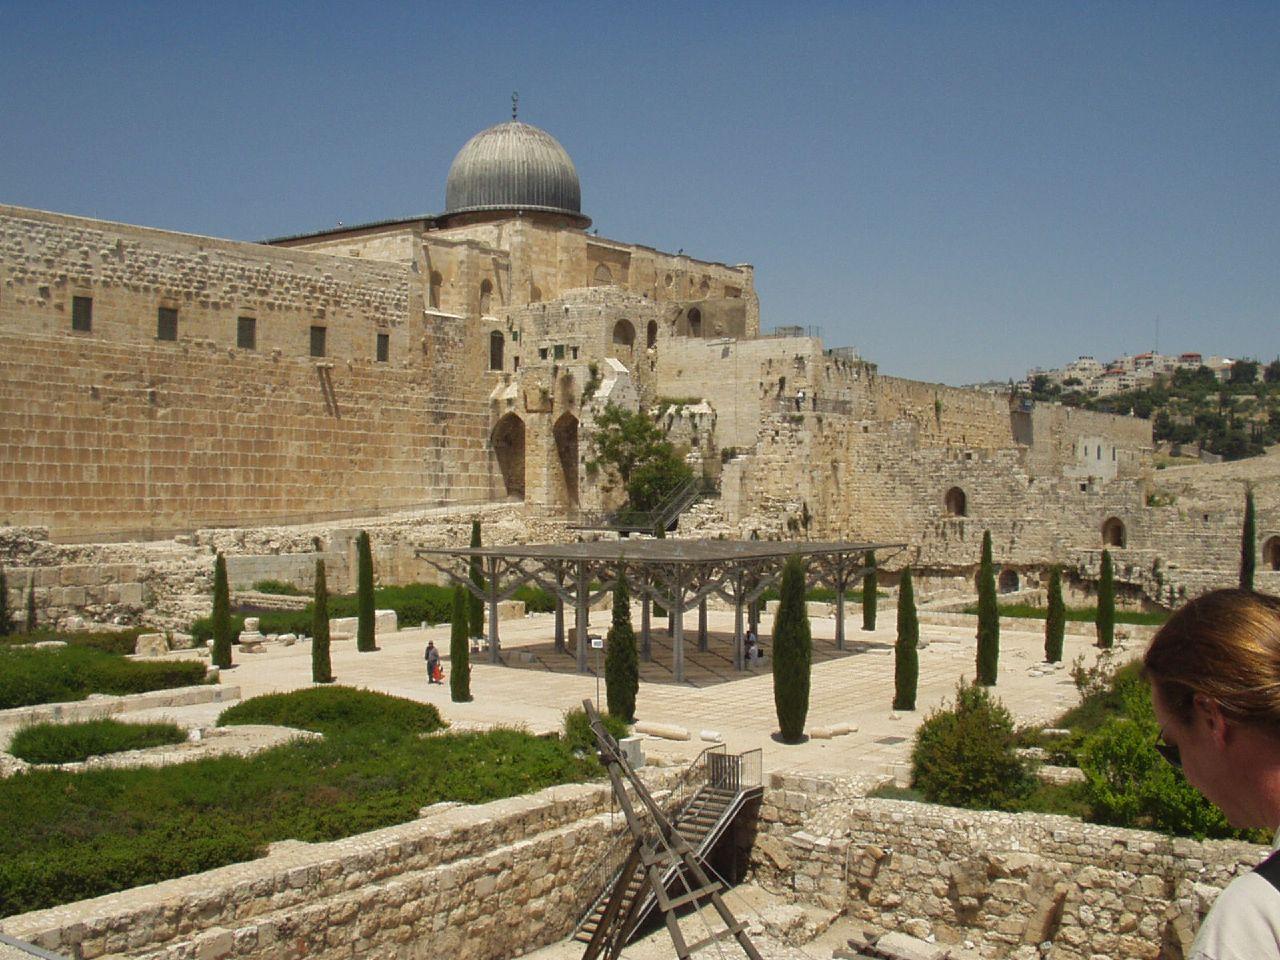 http://2.bp.blogspot.com/-0zfZcdrFrPM/TxcthrnLXgI/AAAAAAAAATg/O00SmgN6Pao/s1600/Jerusalem-10204.jpg